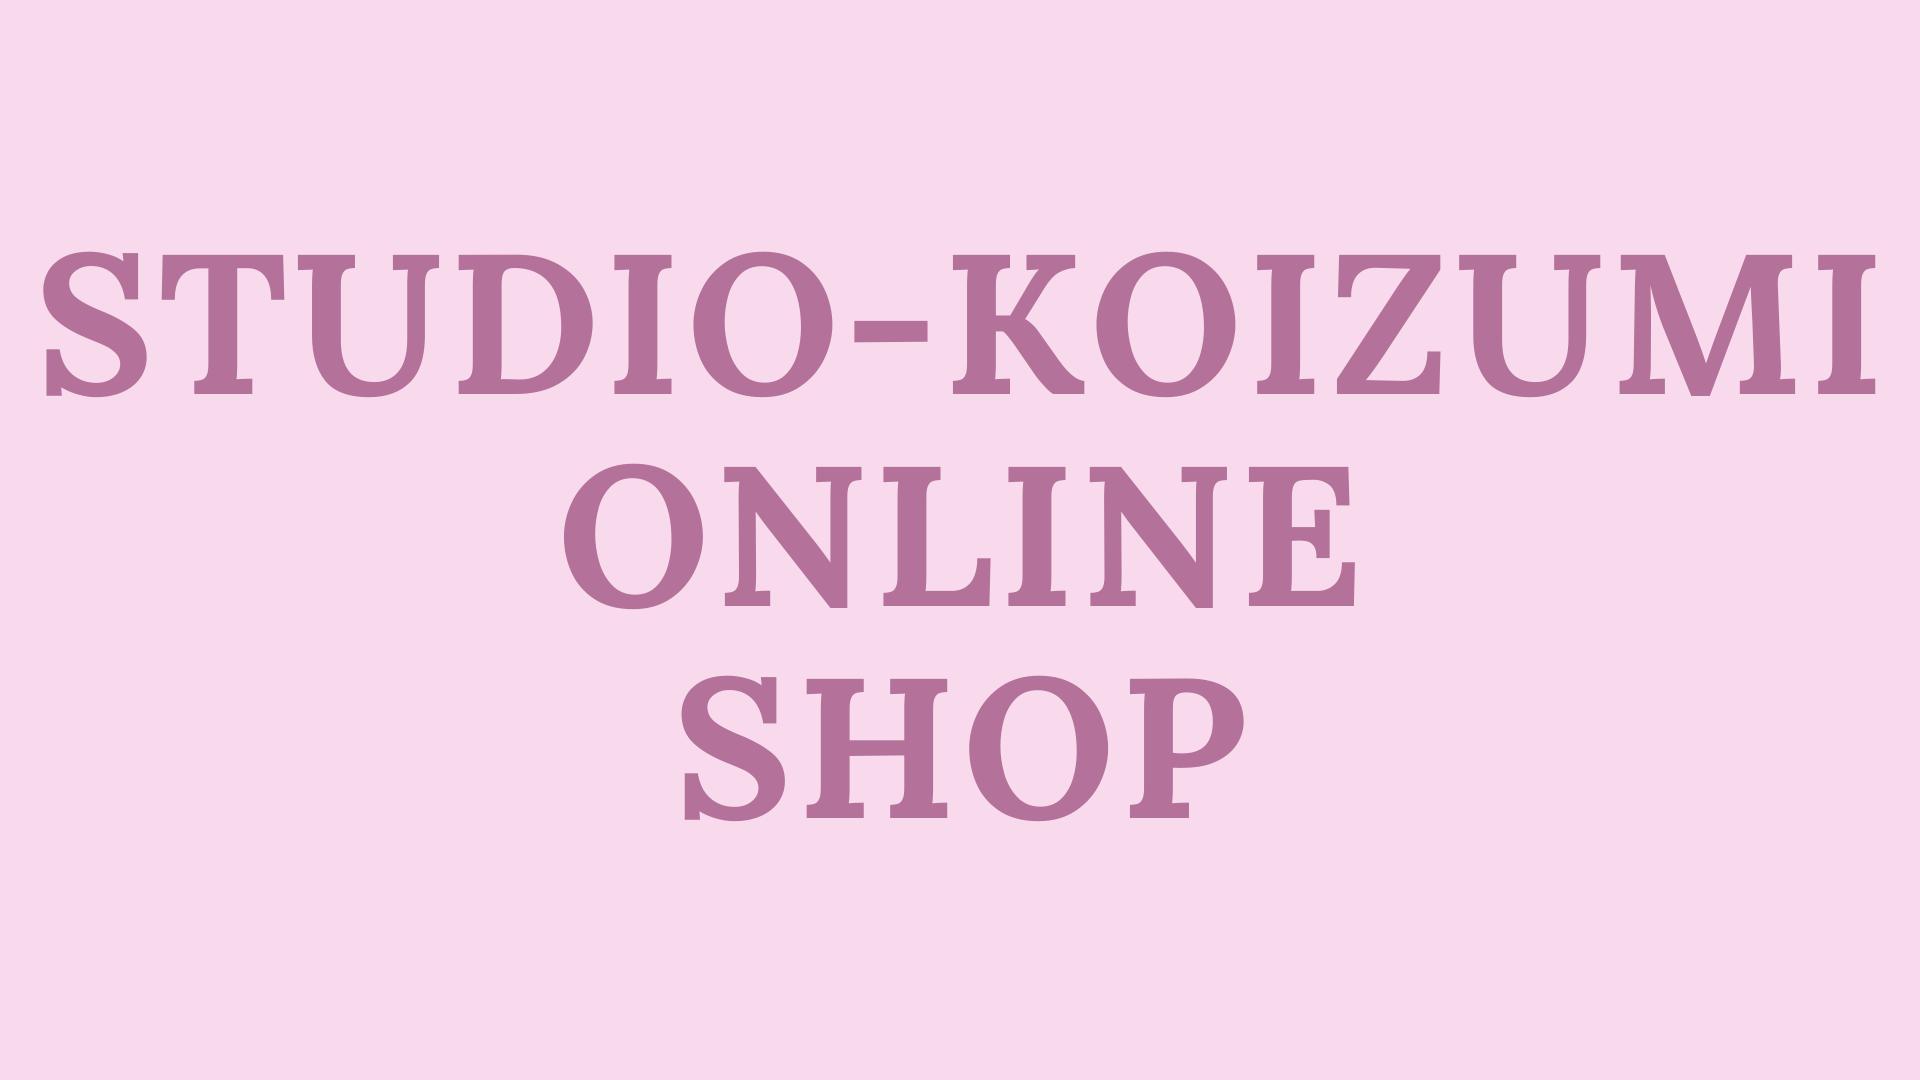 STUDIO-KOIZUMI